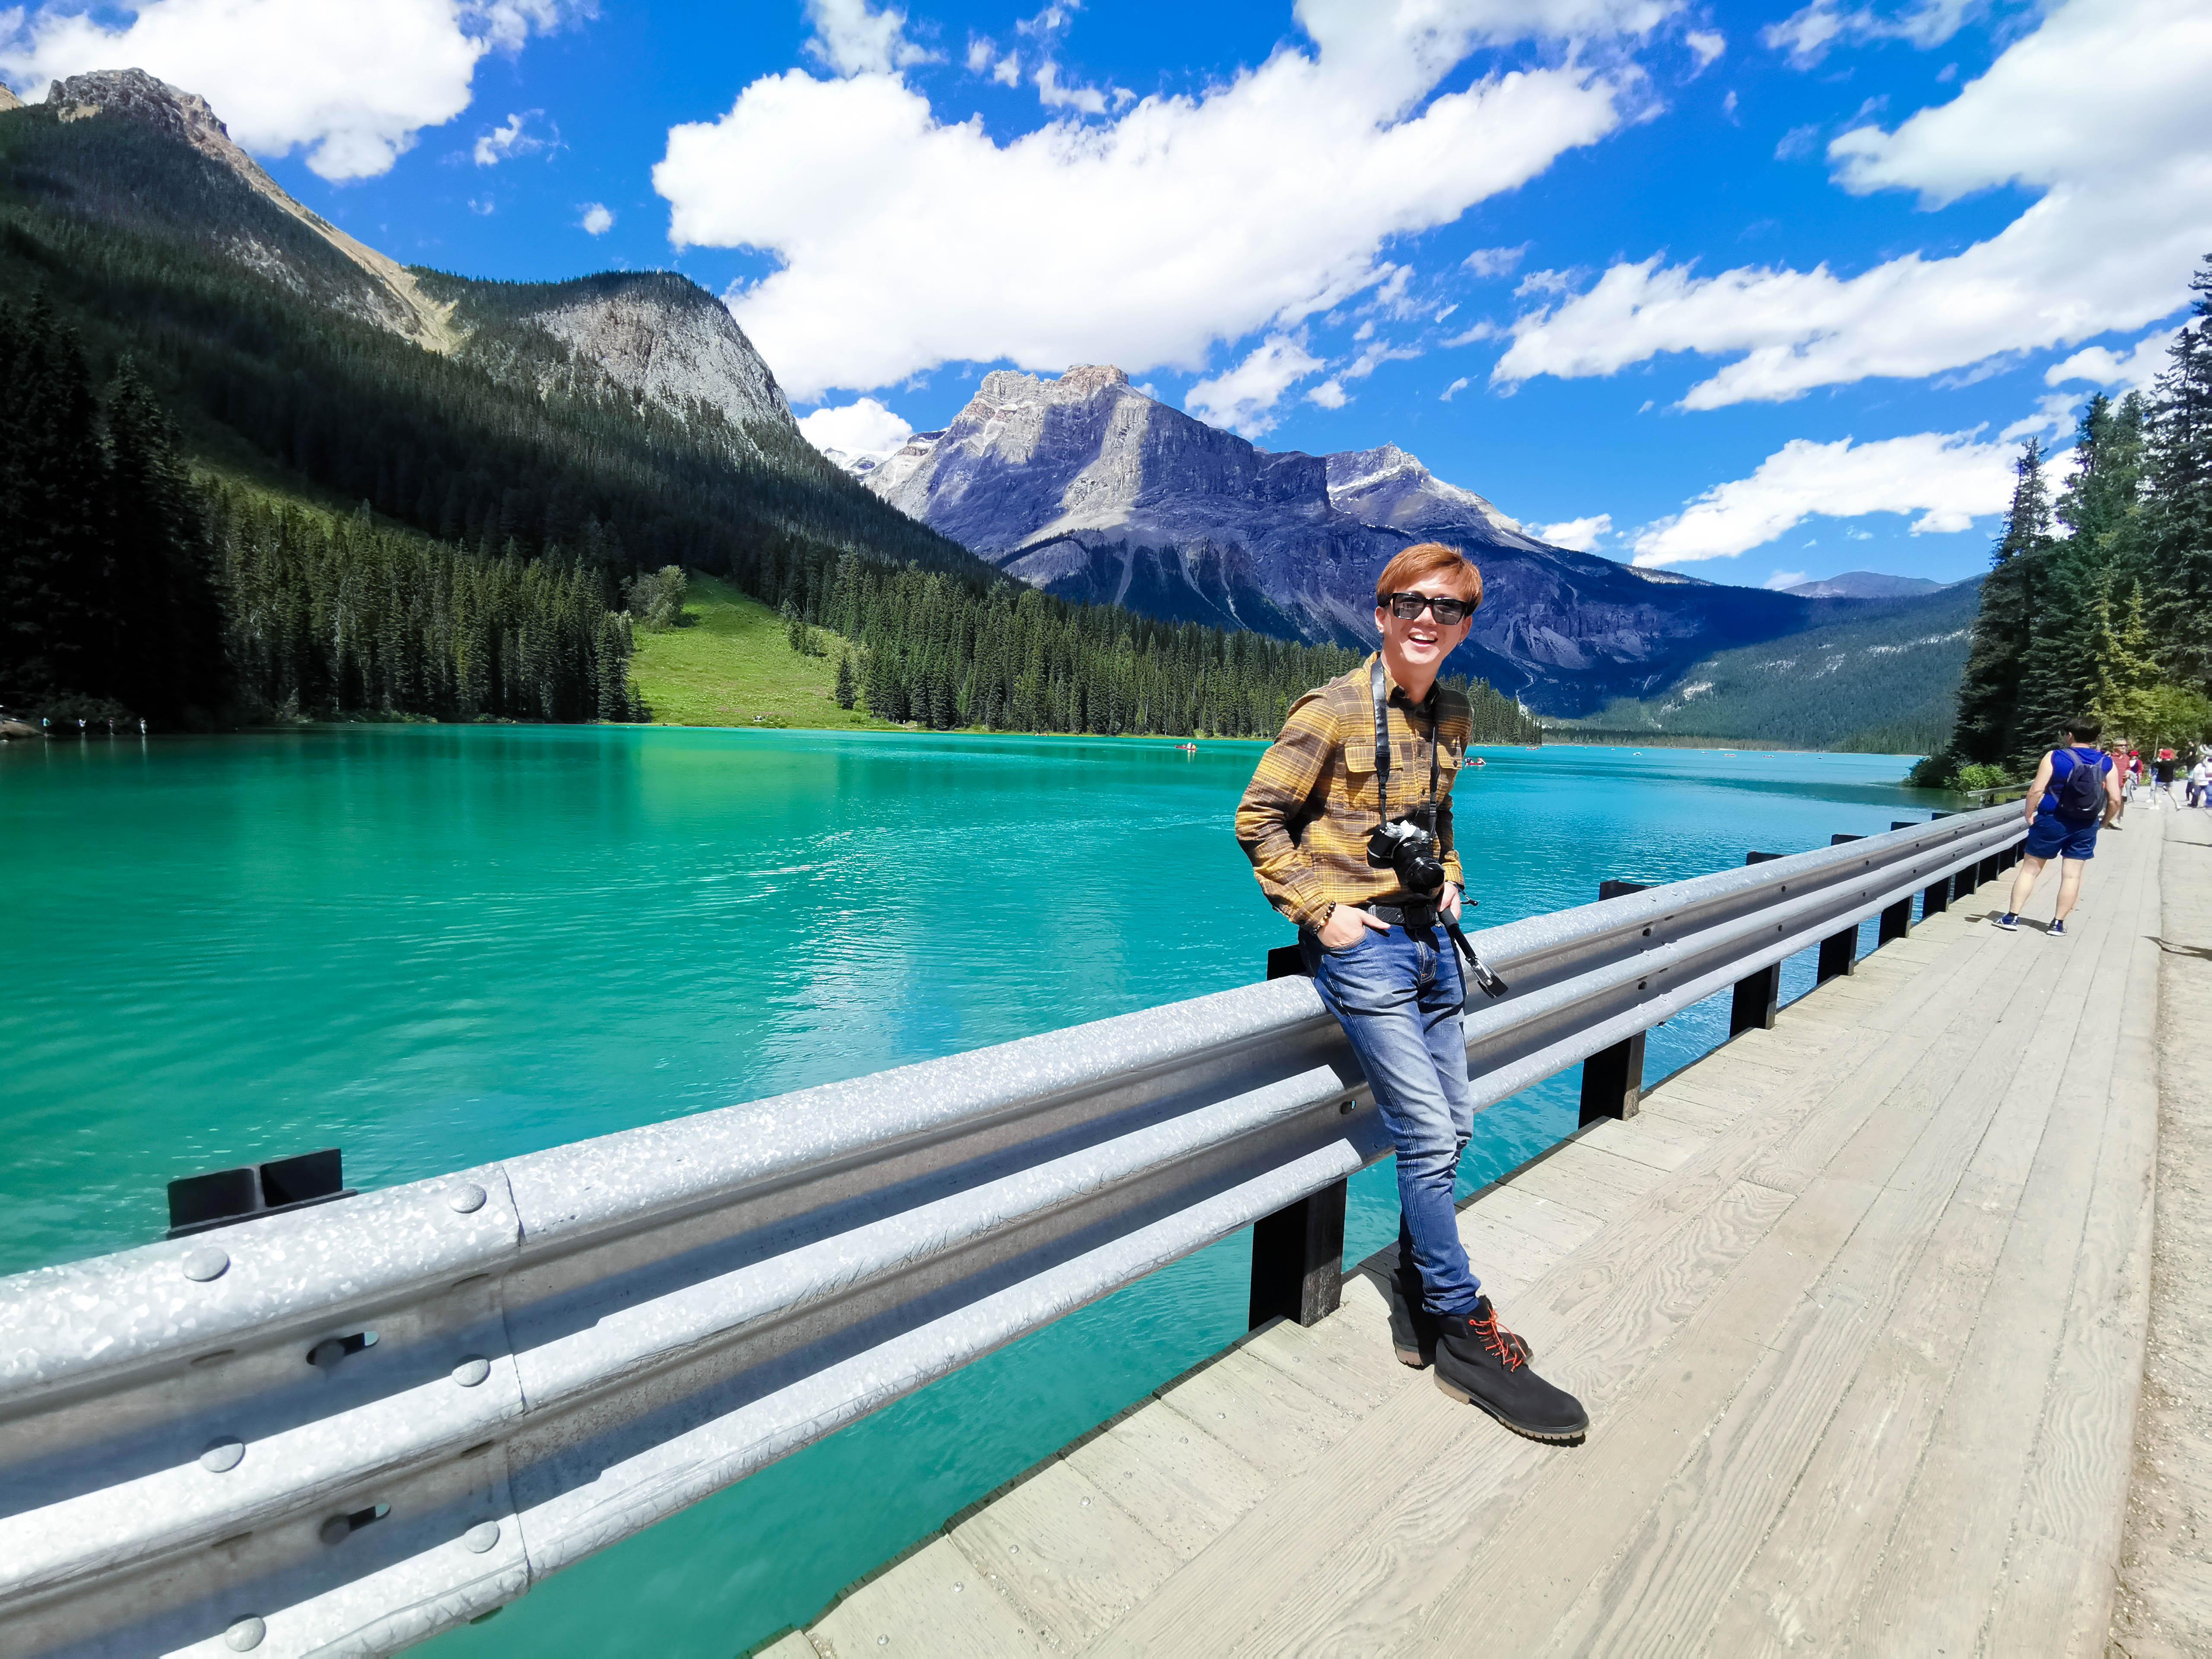 Emerald Lake เที่ยวแคนาดา ทัวร์แคนาดา